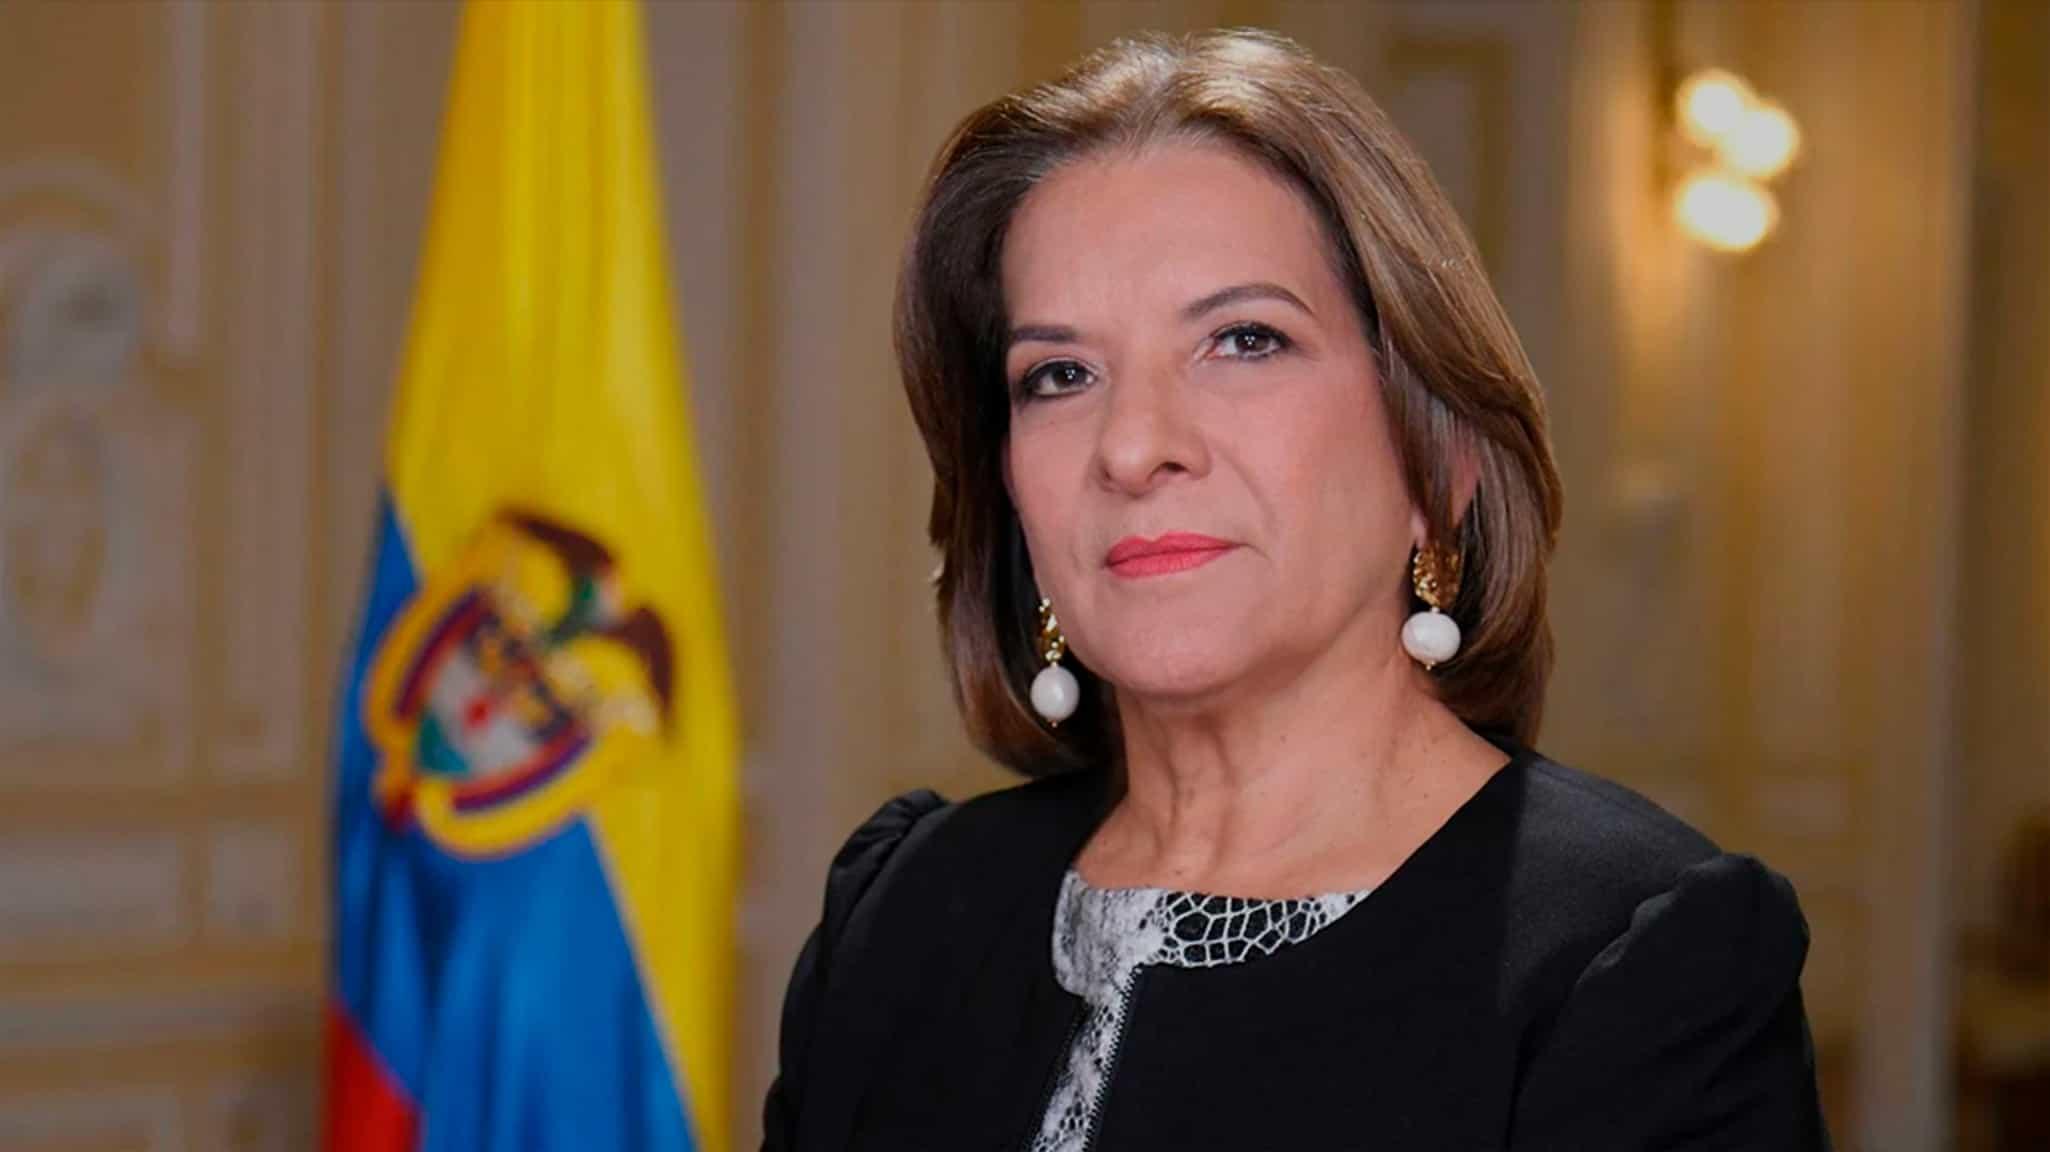 Metrics, metricser, conversación digital, stakeholders, tendencias, Colombia, Margarita Cabello, aborto, colombia, percepción, despenalización, Corte Constitucional,